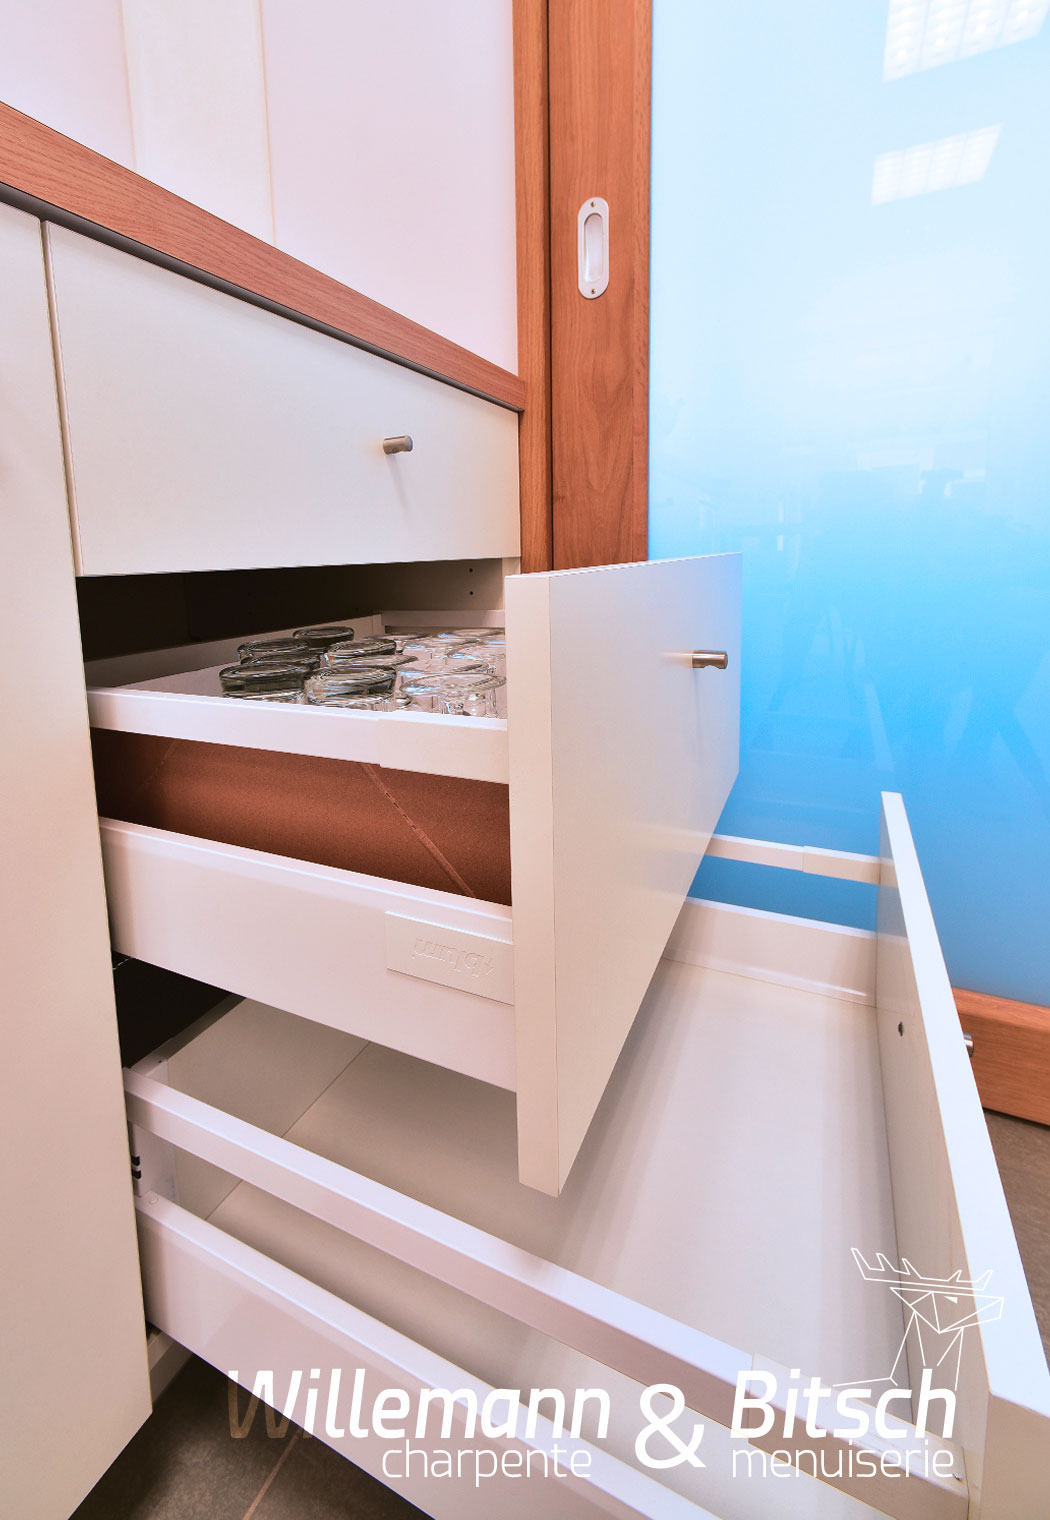 tiroir bois alsace menuiserie agencement meuble mobilier modulable personnalisable